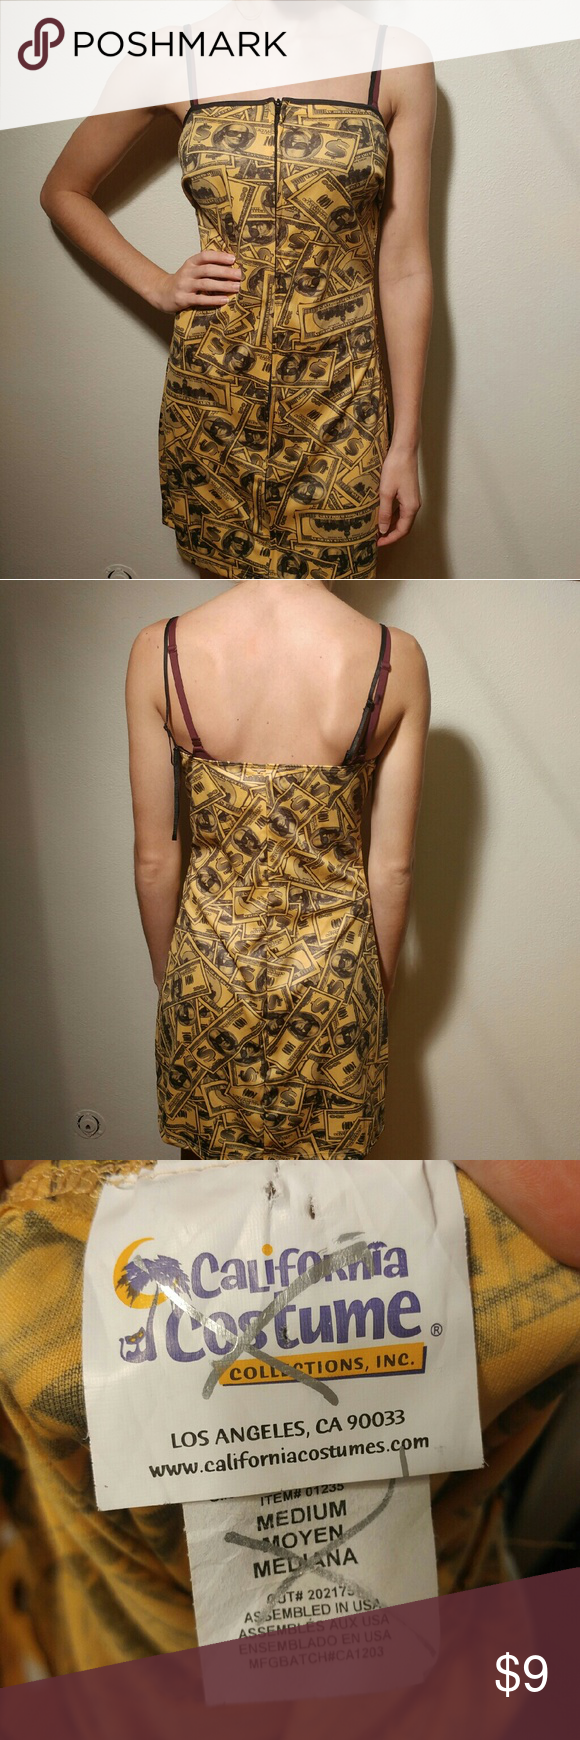 322f4a44573 100 dollar bill costume dress size medium Money costume dress ...